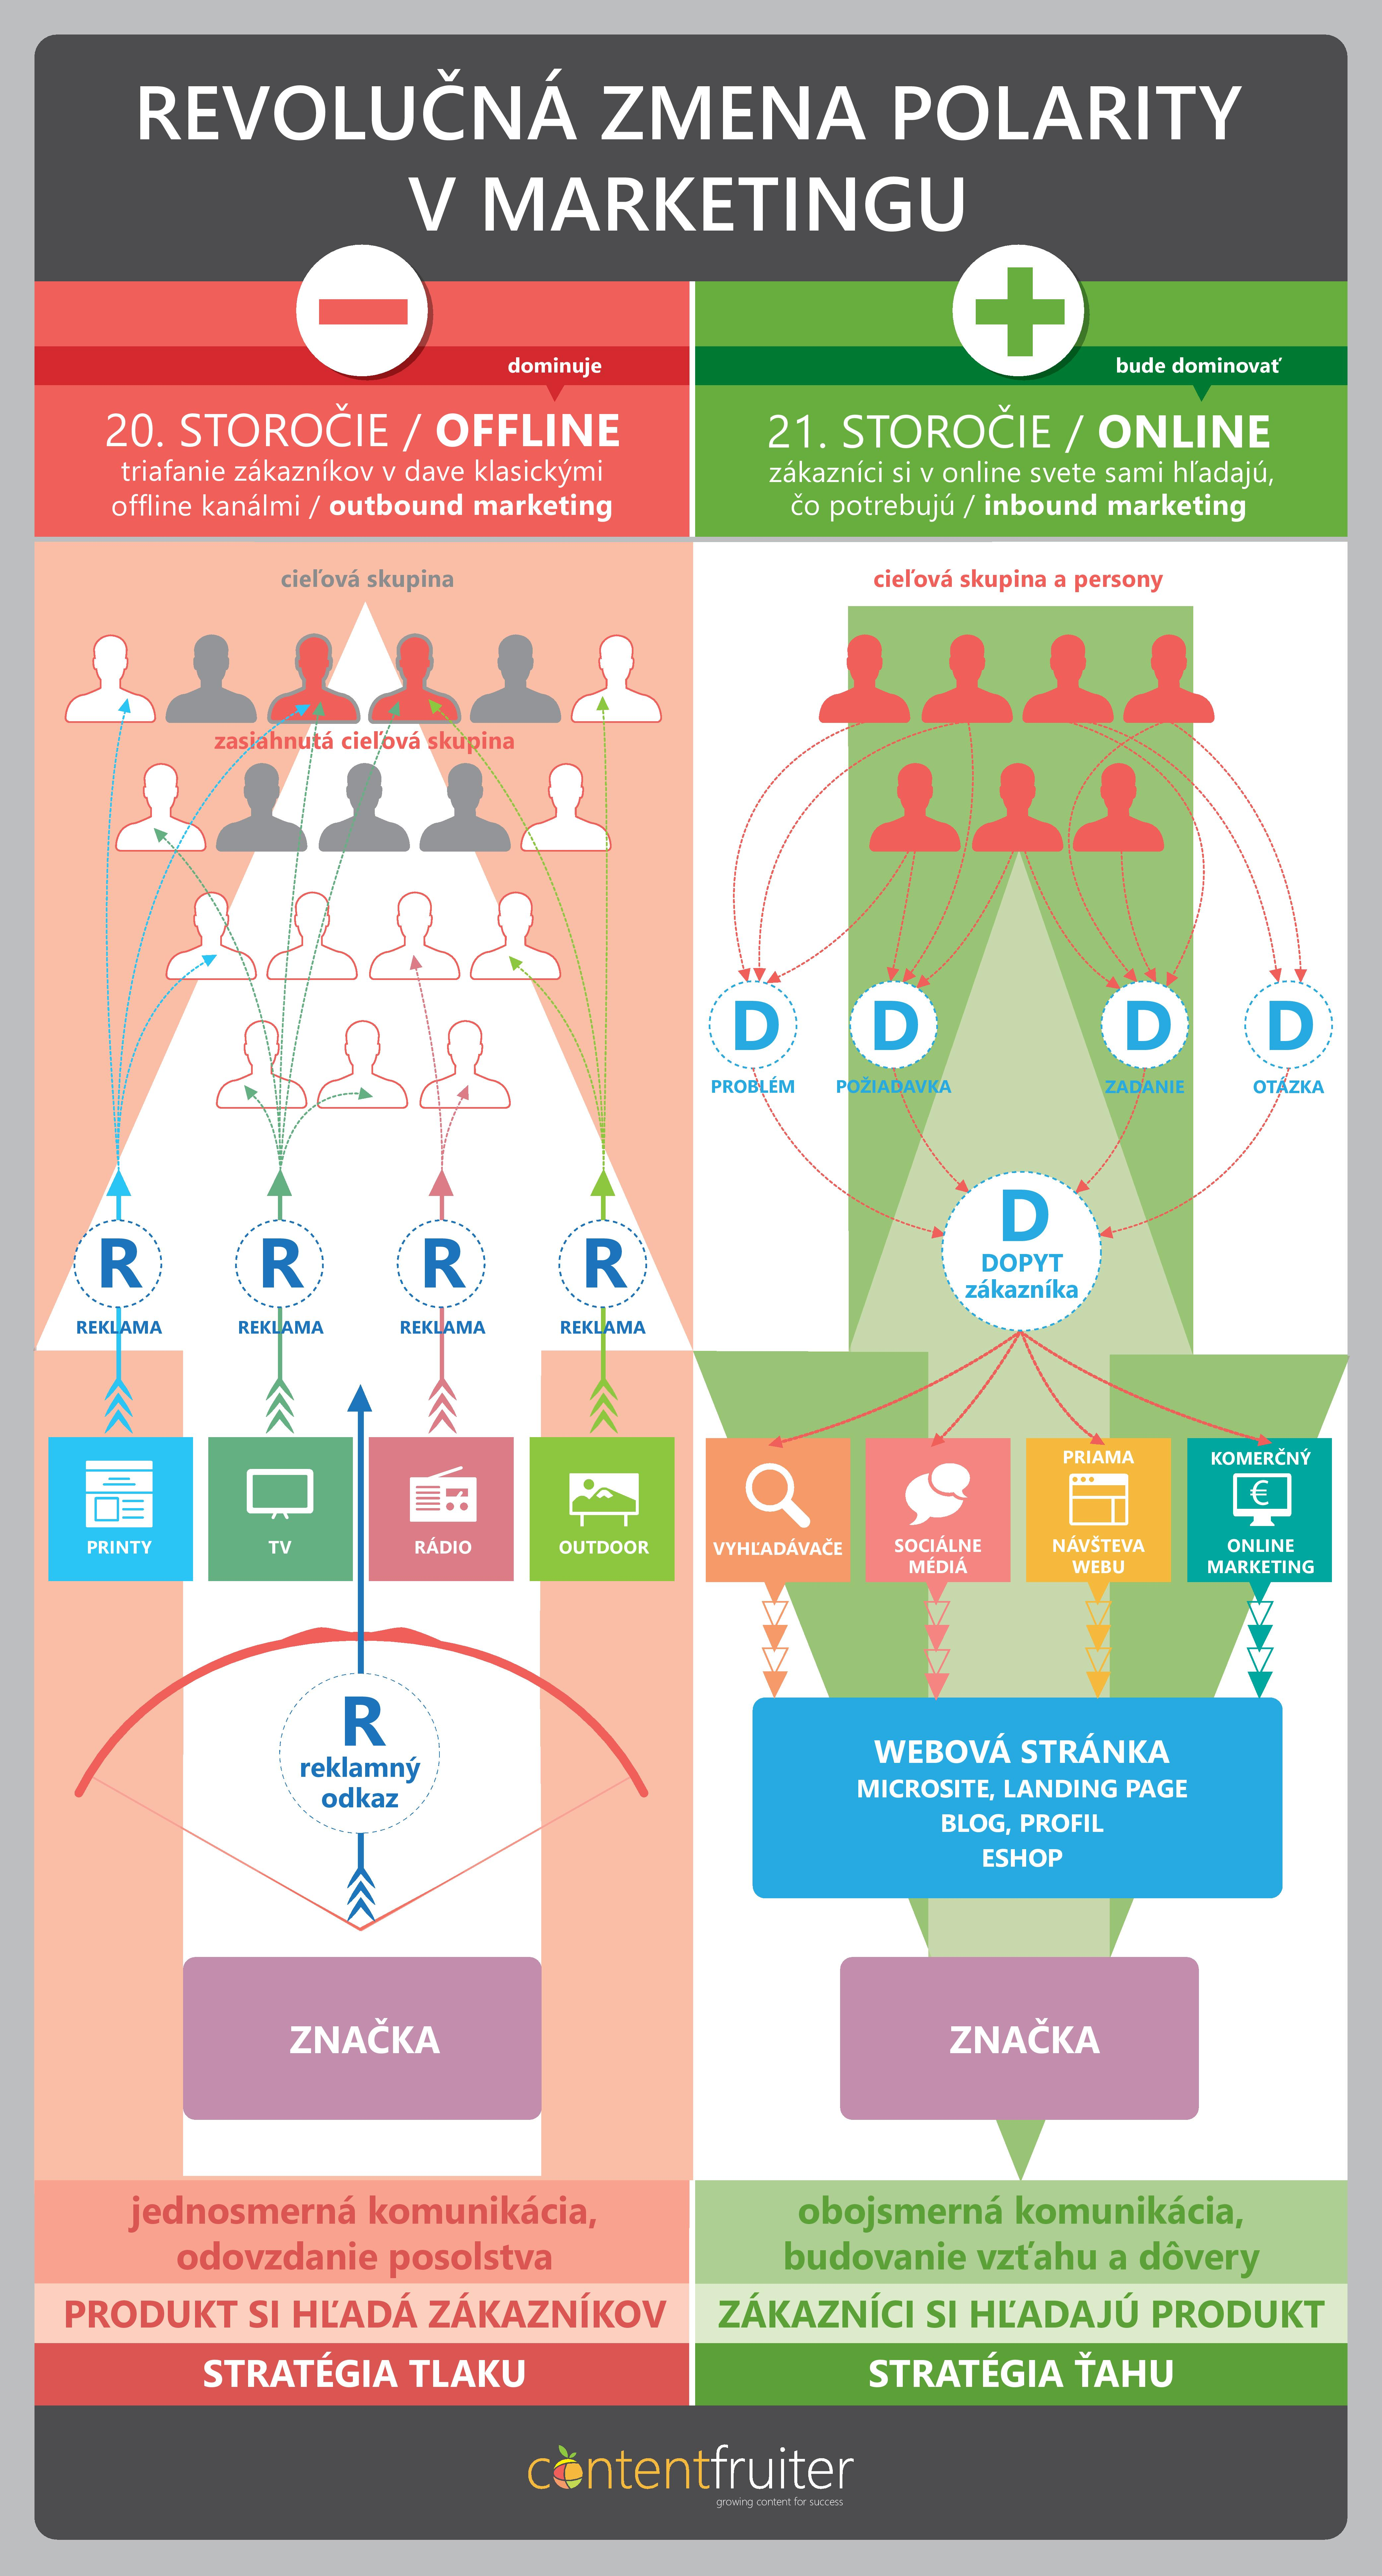 Revolučná zmena polarity v marketingu | Infografika ContentFruiter